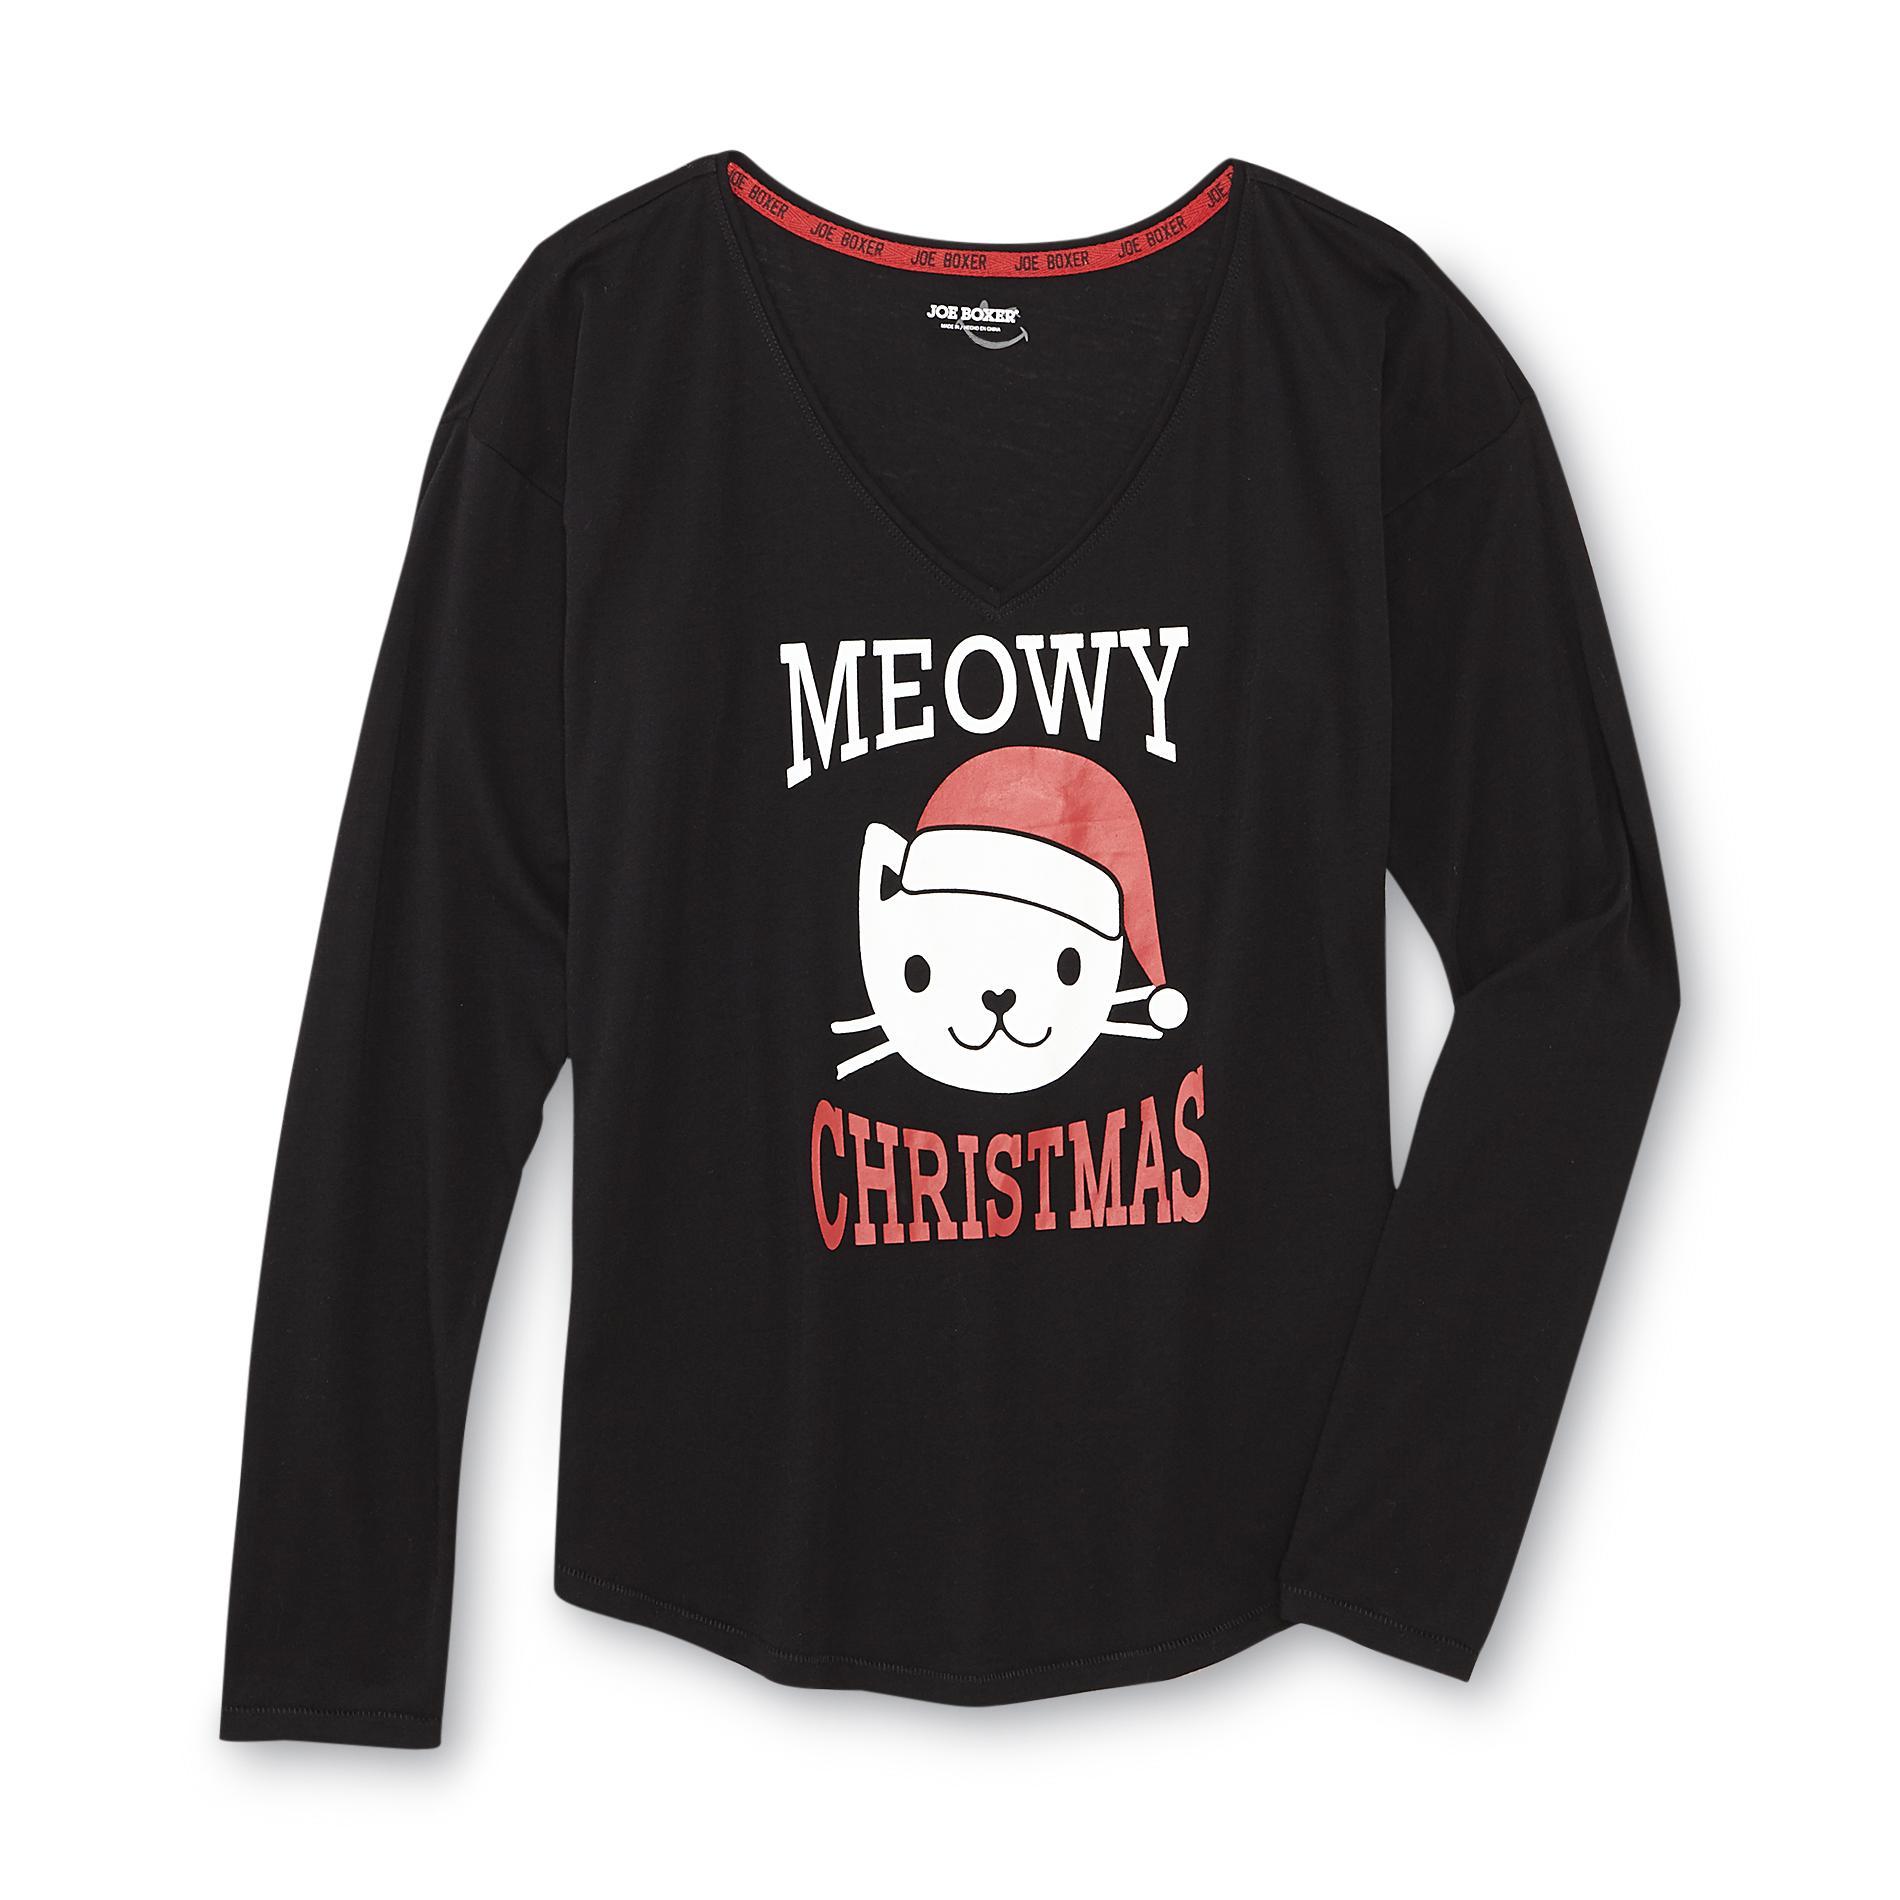 Joe Boxer Junior's Graphic T-Shirt - Meowy Christmas